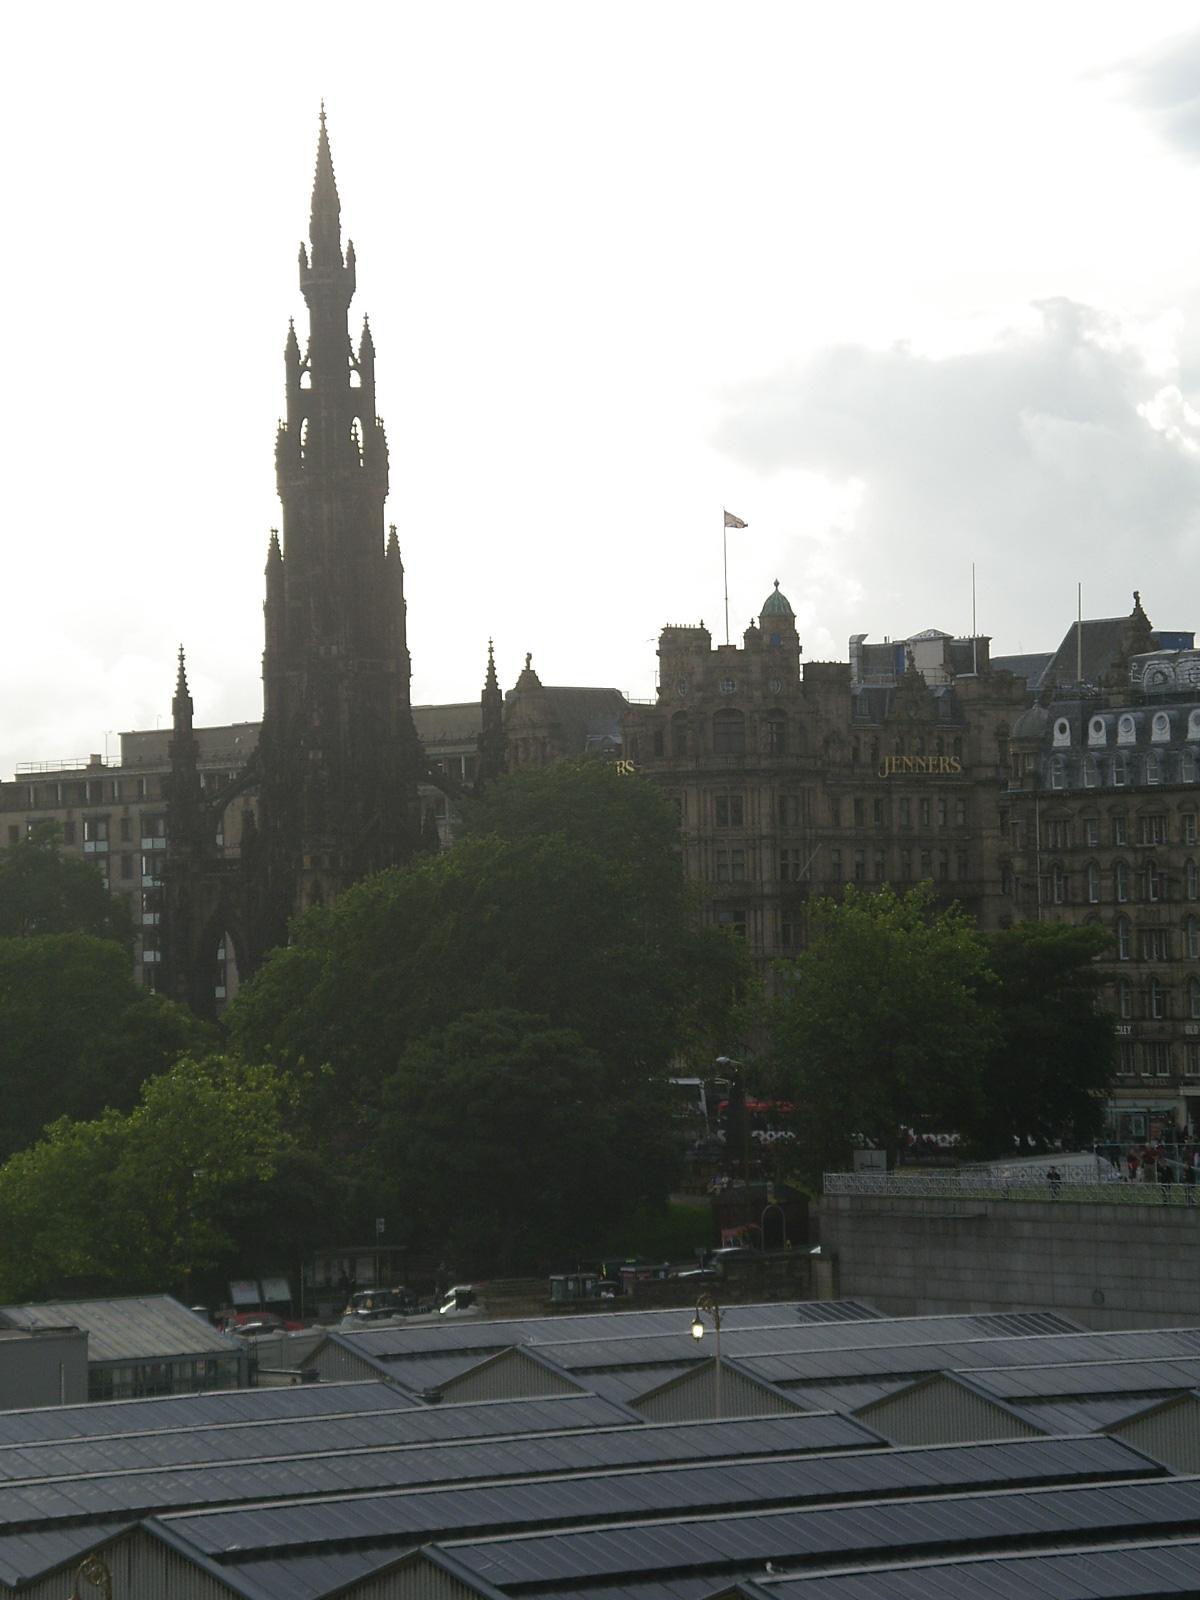 Scenary with Scott Monument, Edinburgh